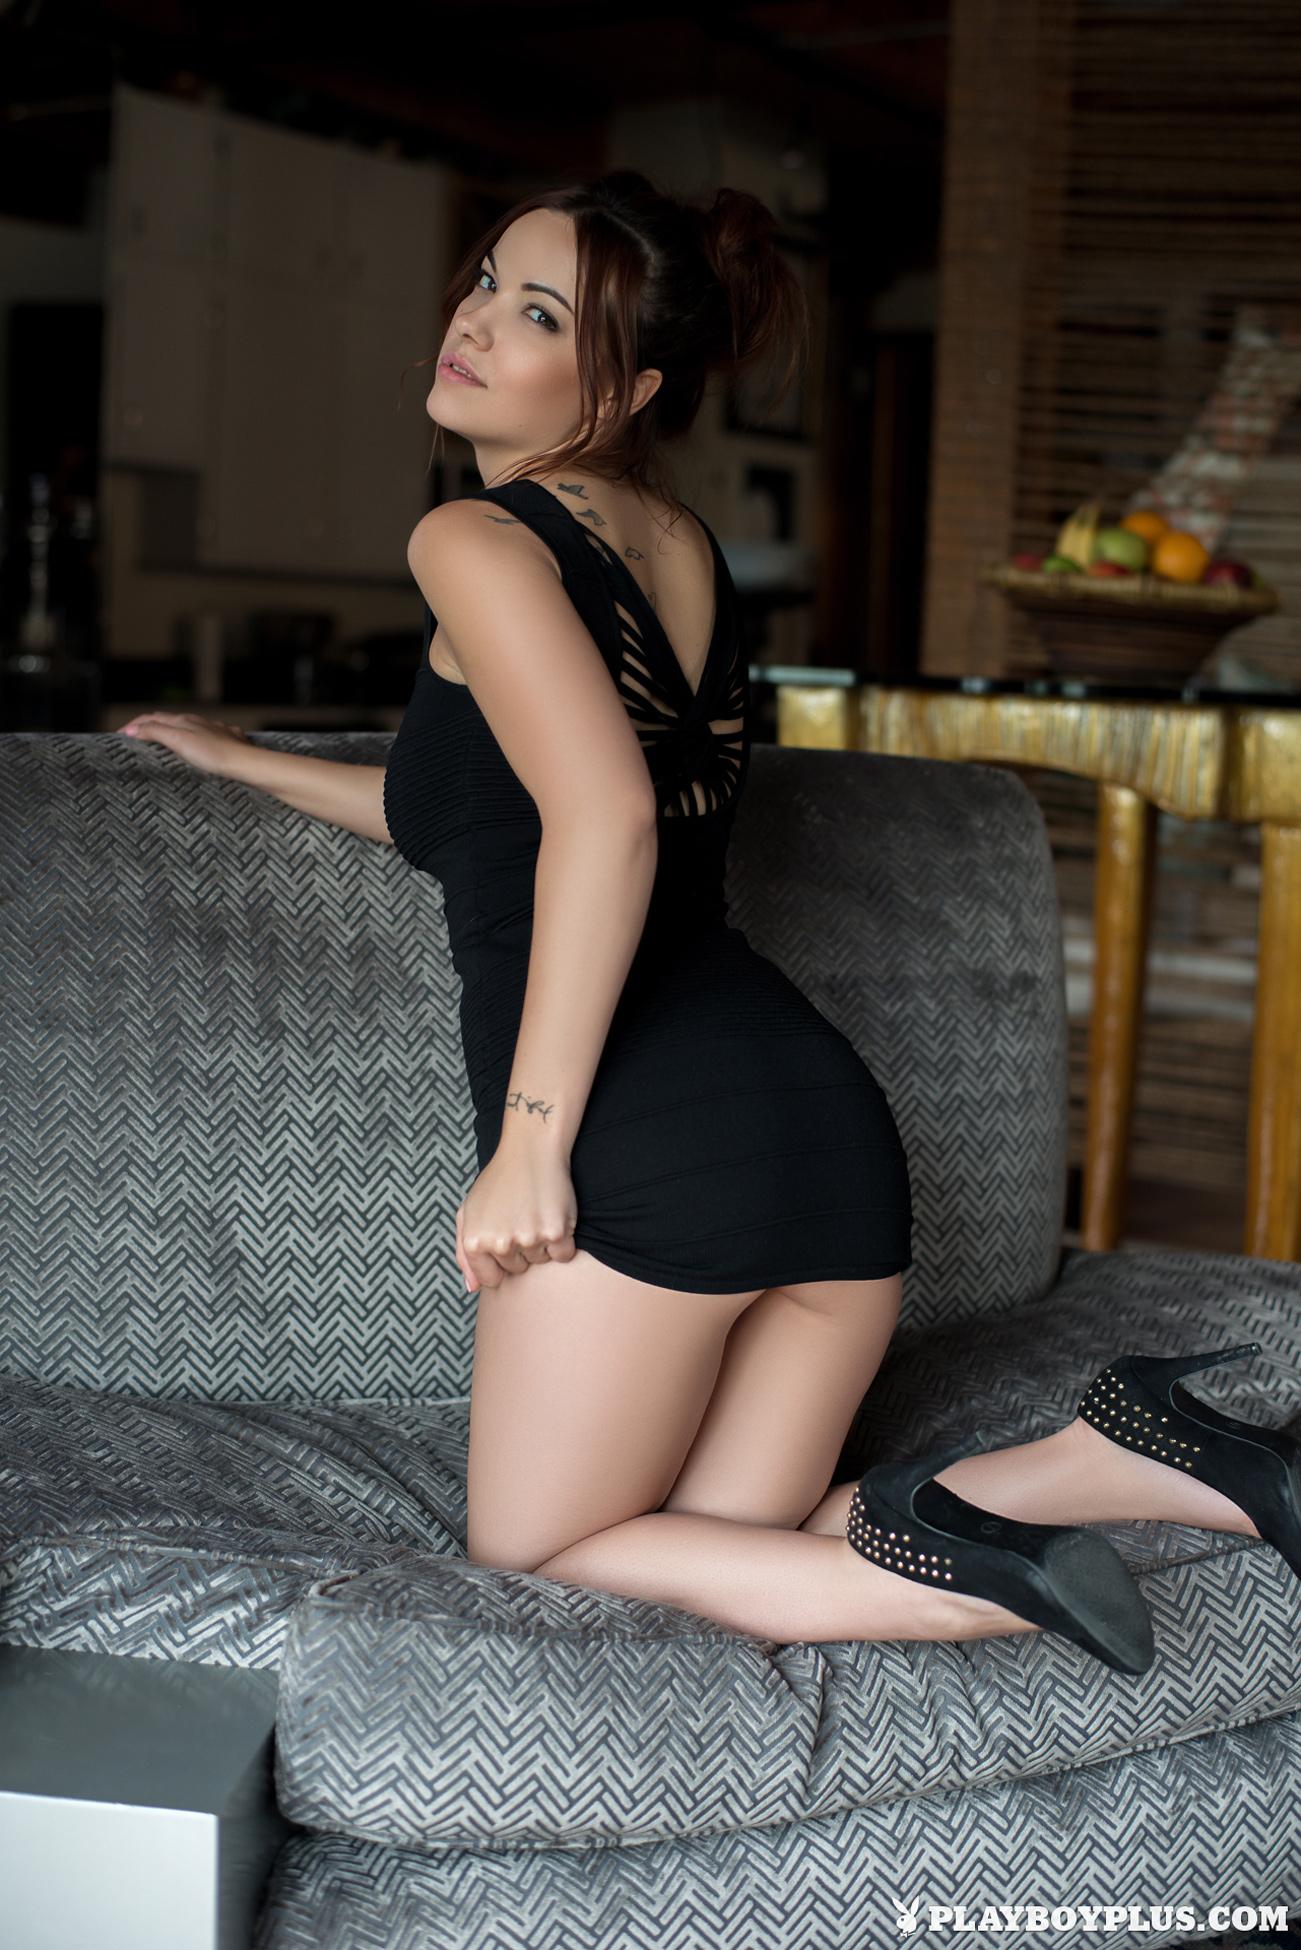 elizabeth-marxs-boobs-sofa-naked-playboy-03